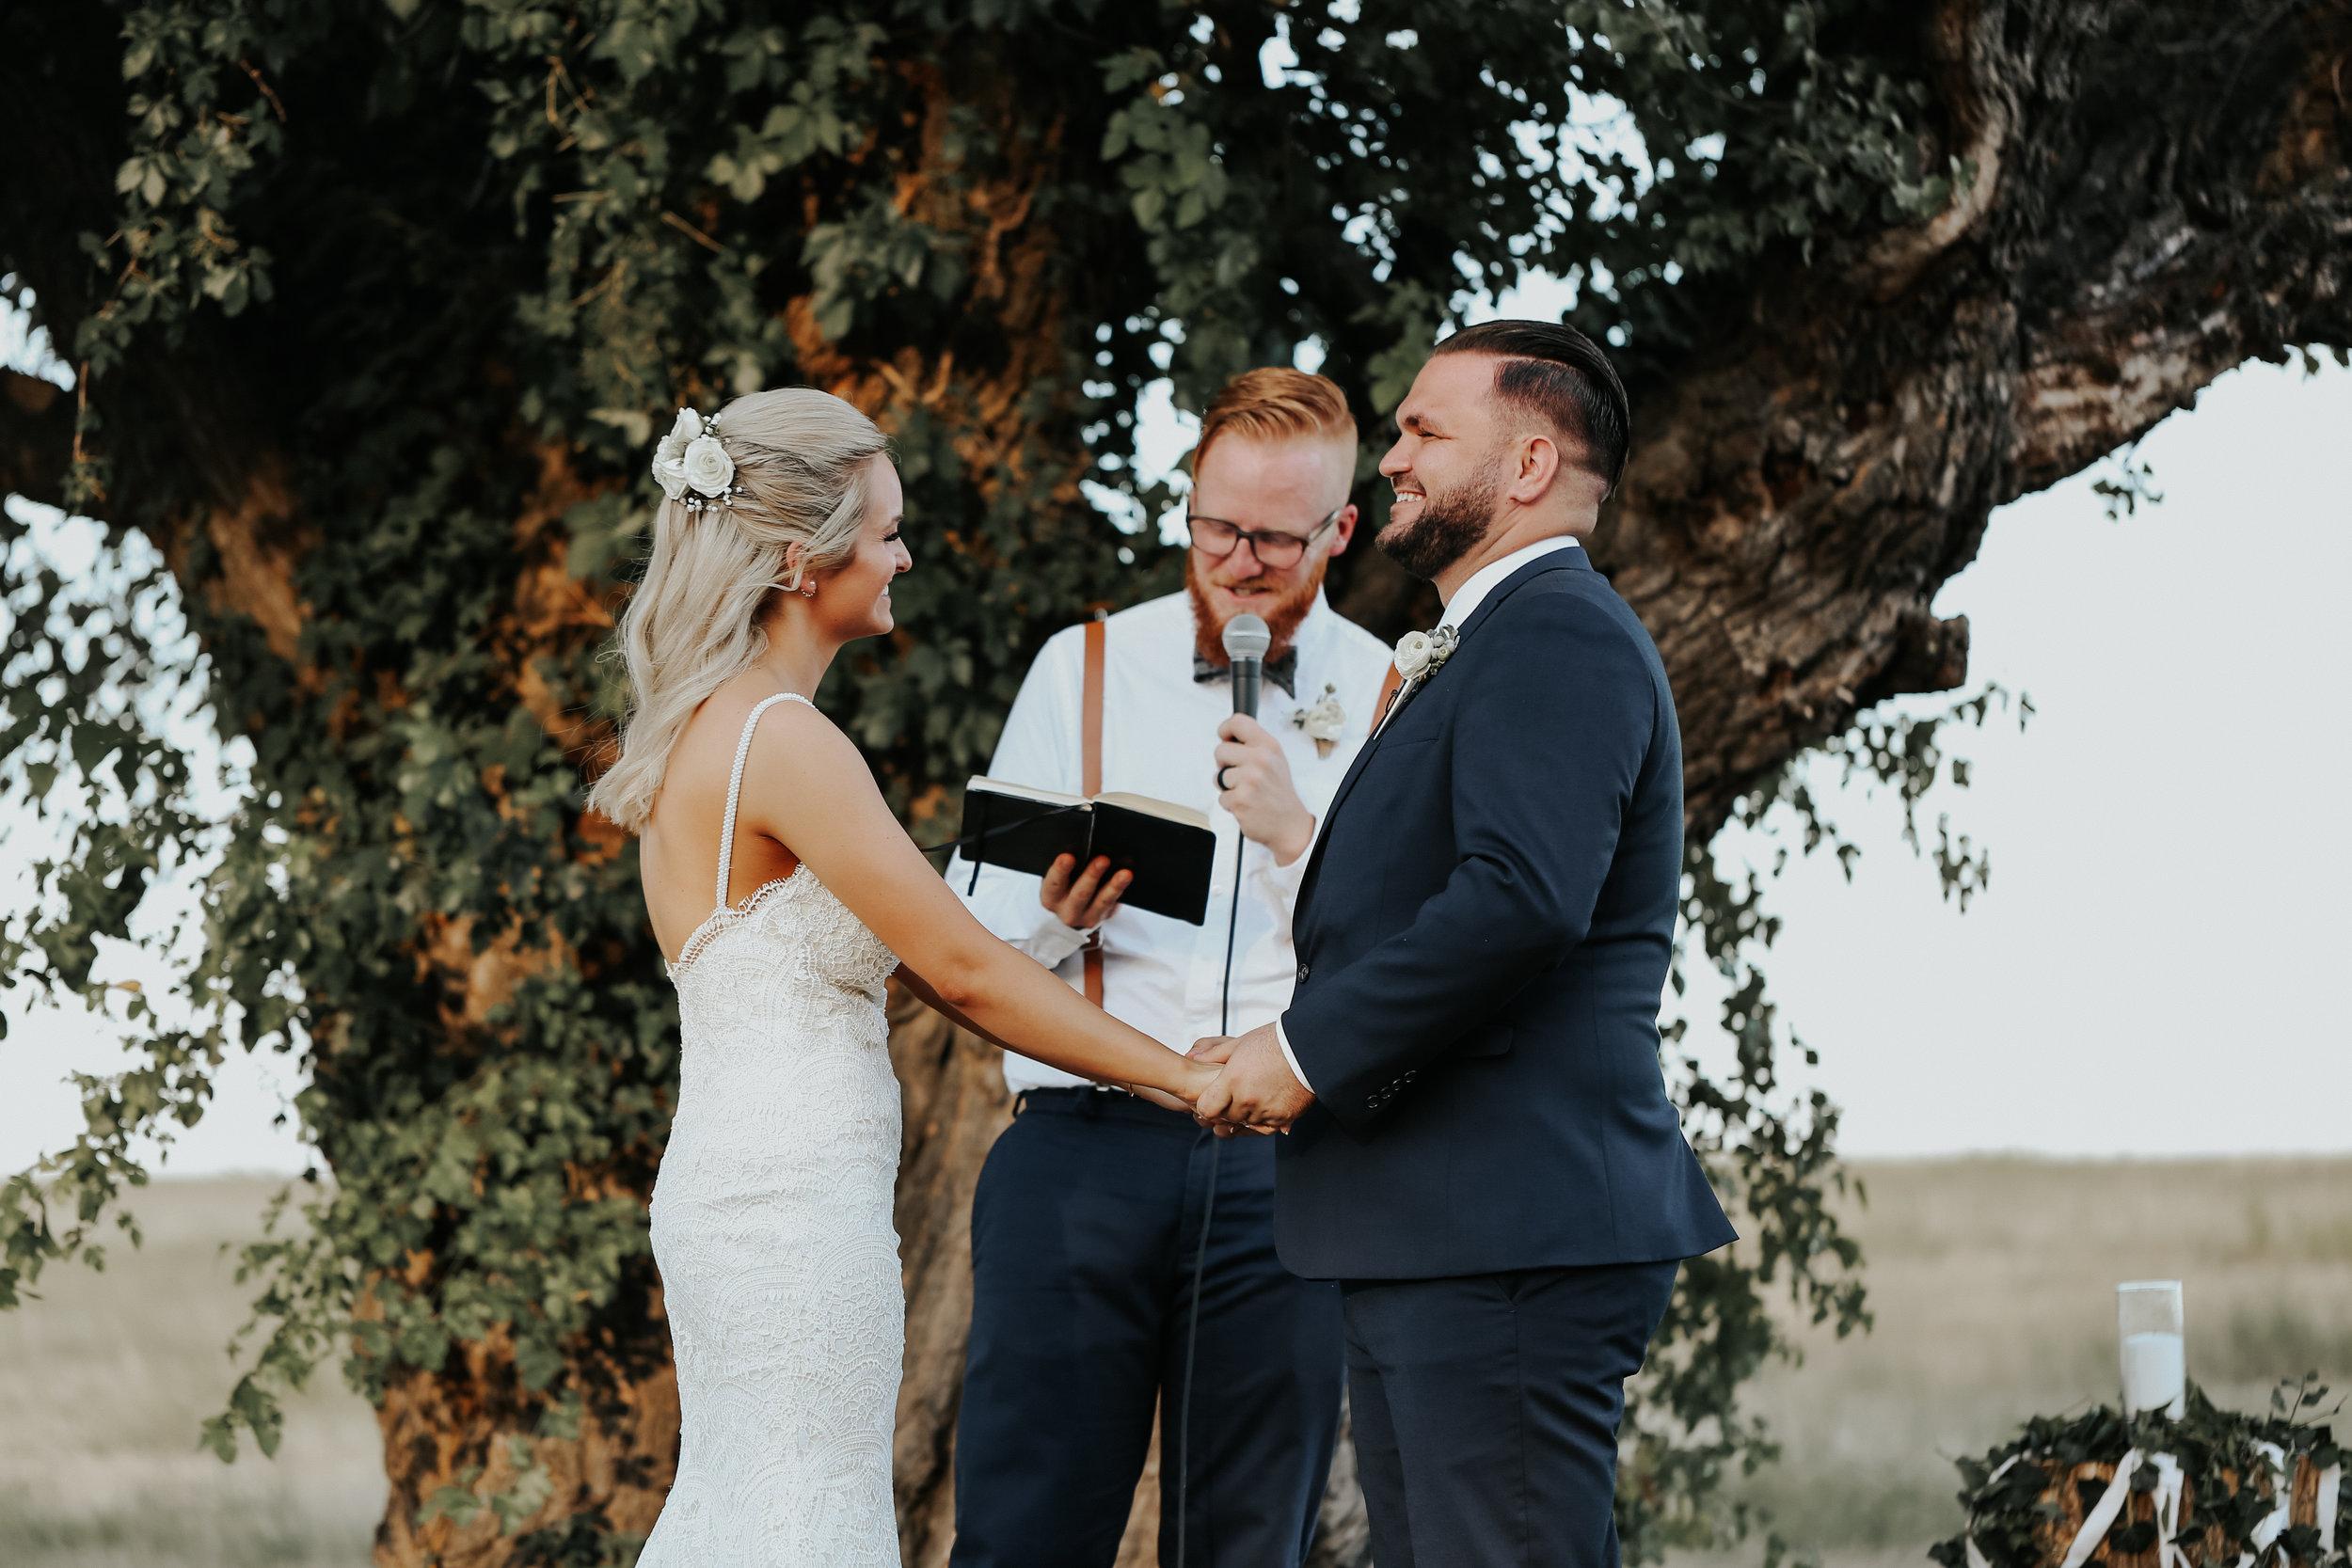 Backyard_Wedding_Oklahoma_MelissaMarshall_20.jpg